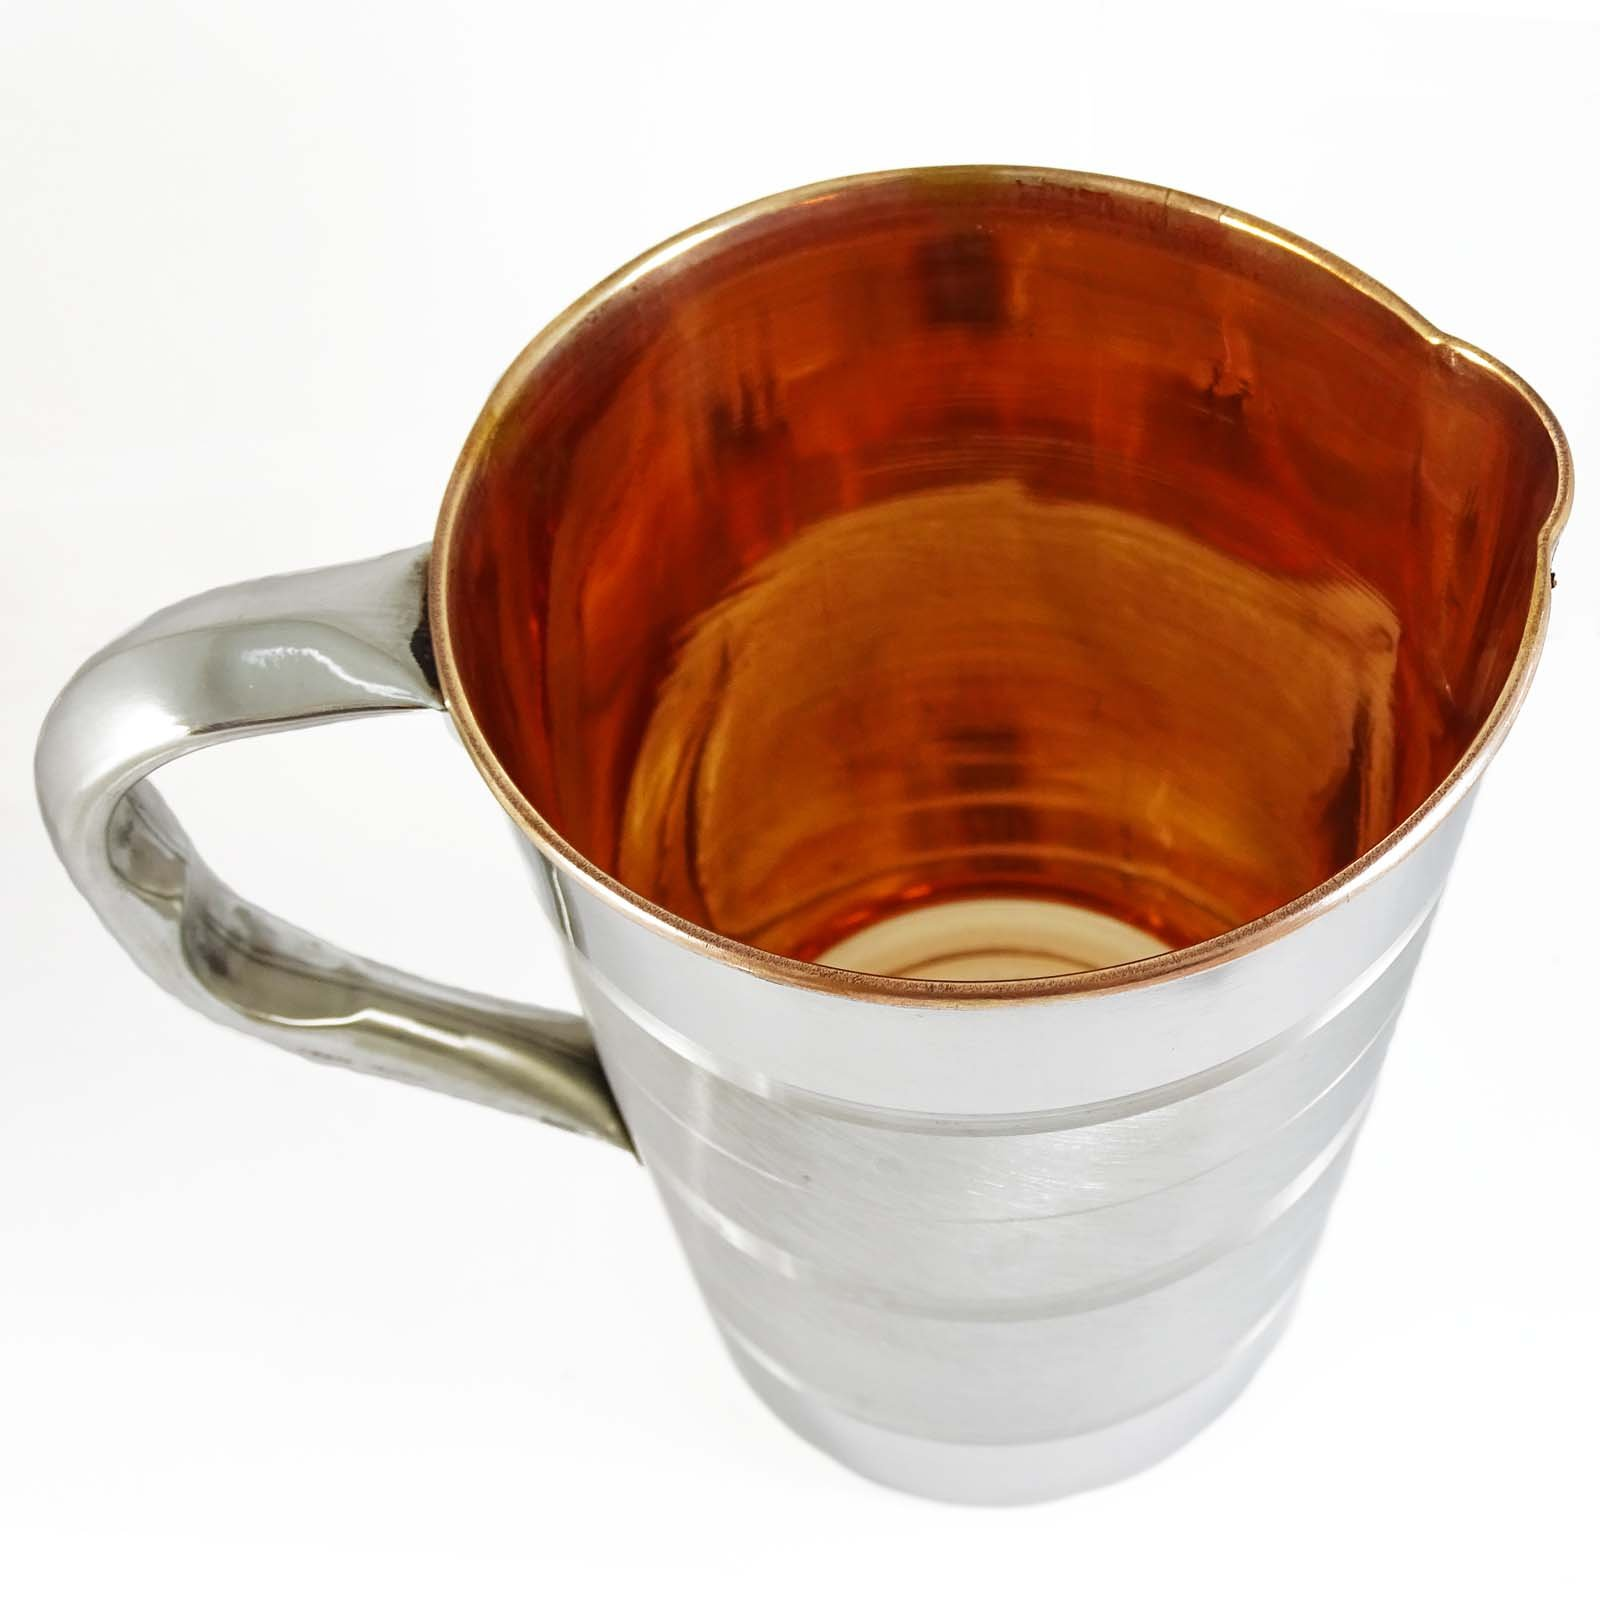 ibaexports Tableware Traditional Serving Ayurvedic Copper Steel Kitchenware Water Jug by ibaexports (Image #2)